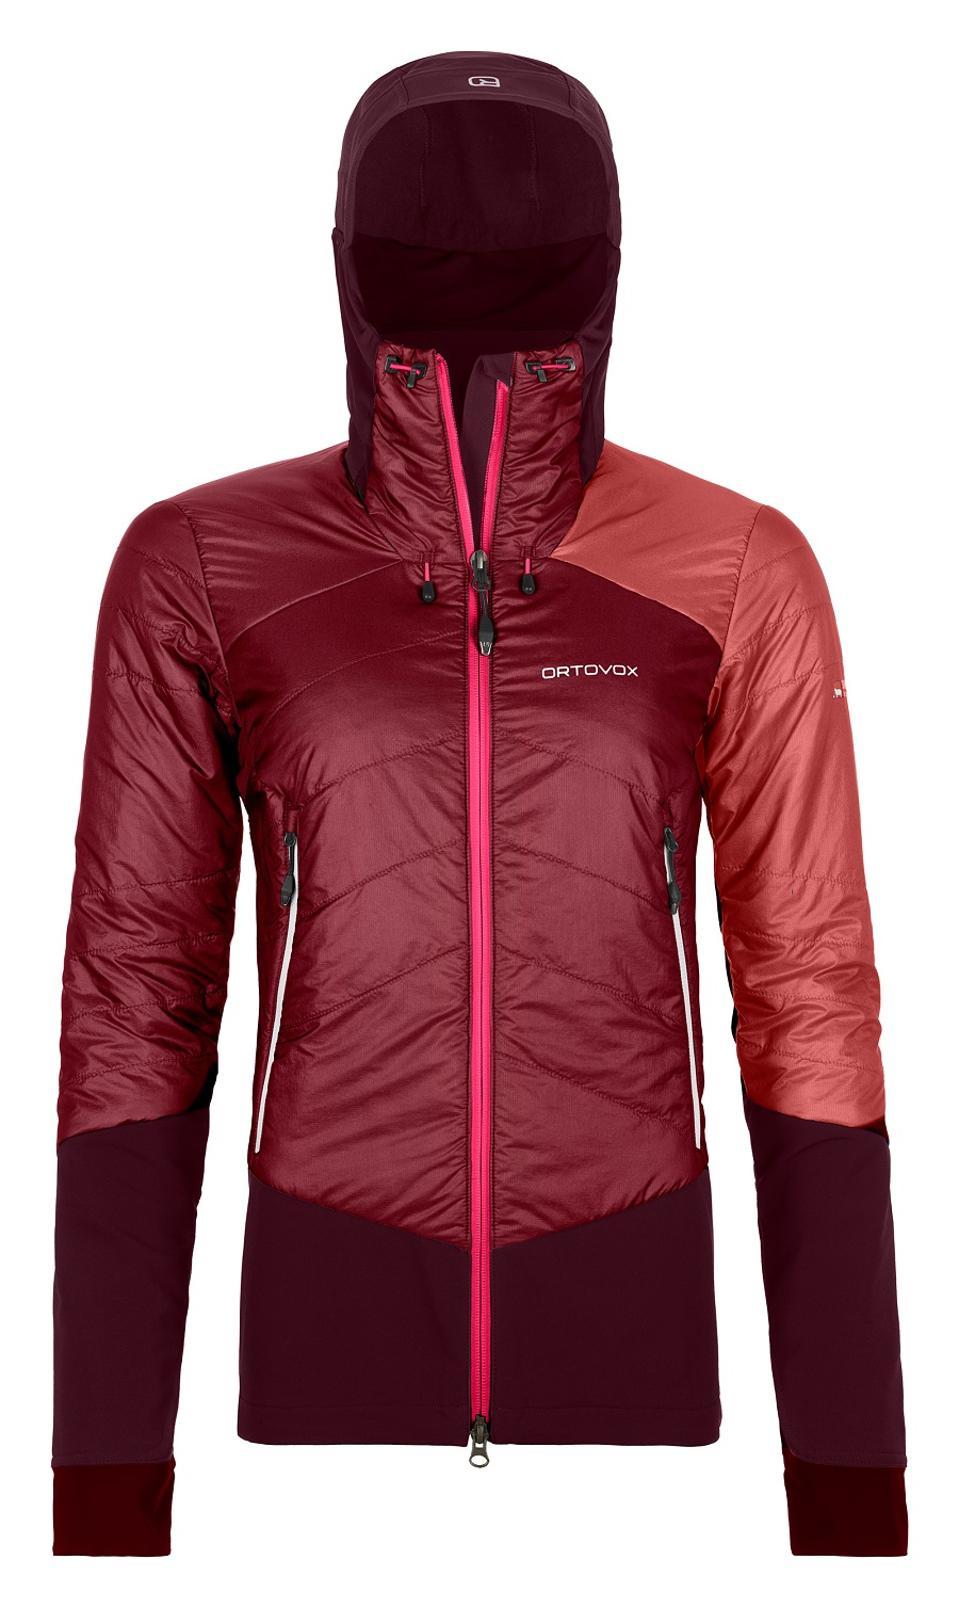 Ortovox ski jacket